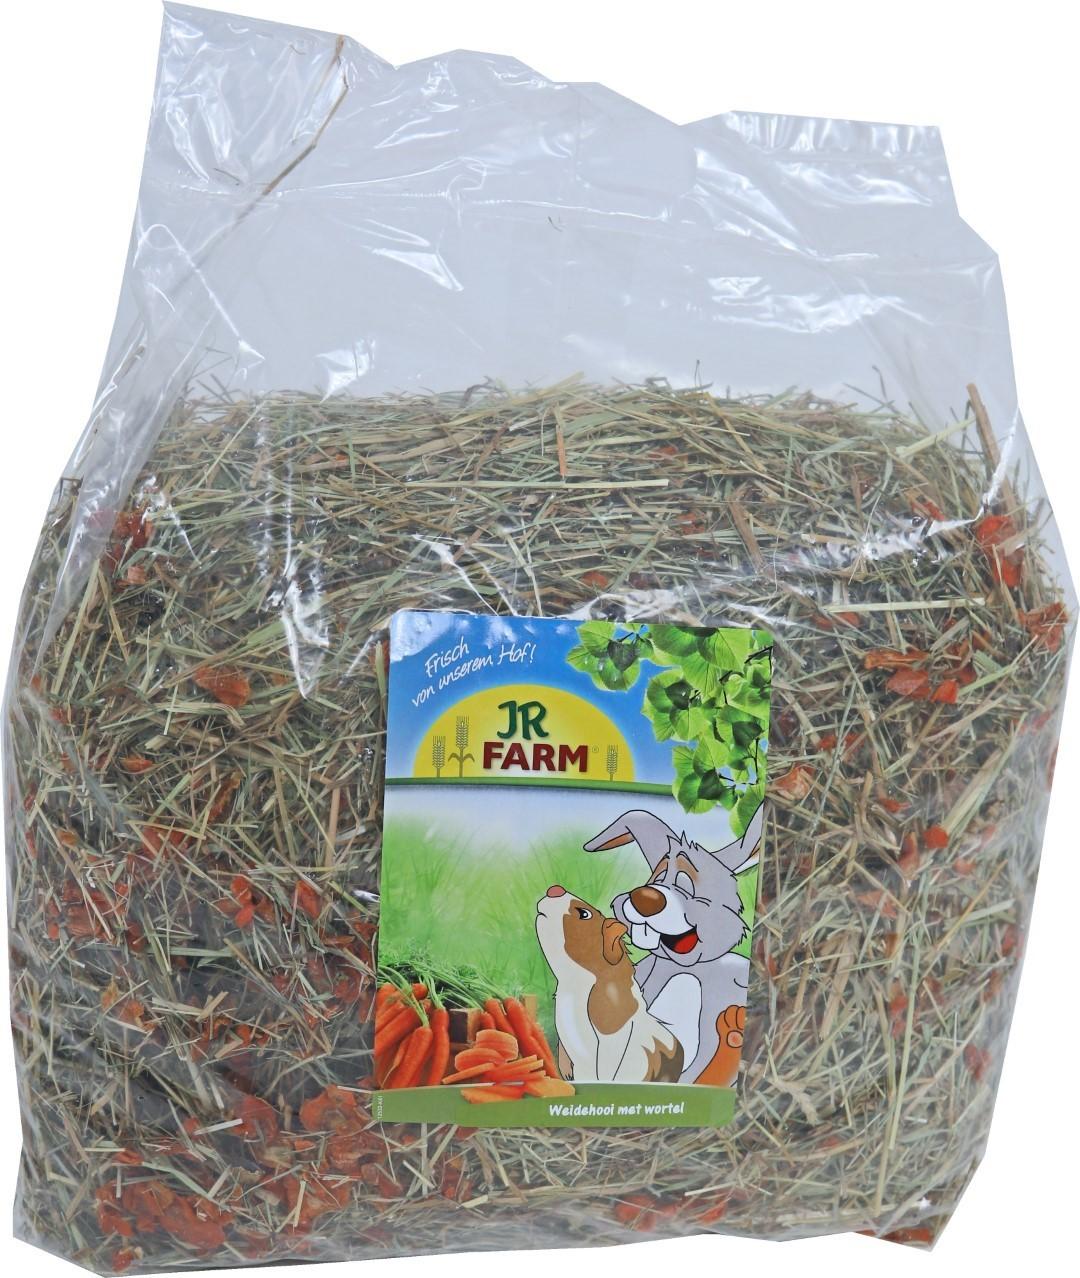 JR Farm knaagdier weidehooi met wortel 500 gram 05823